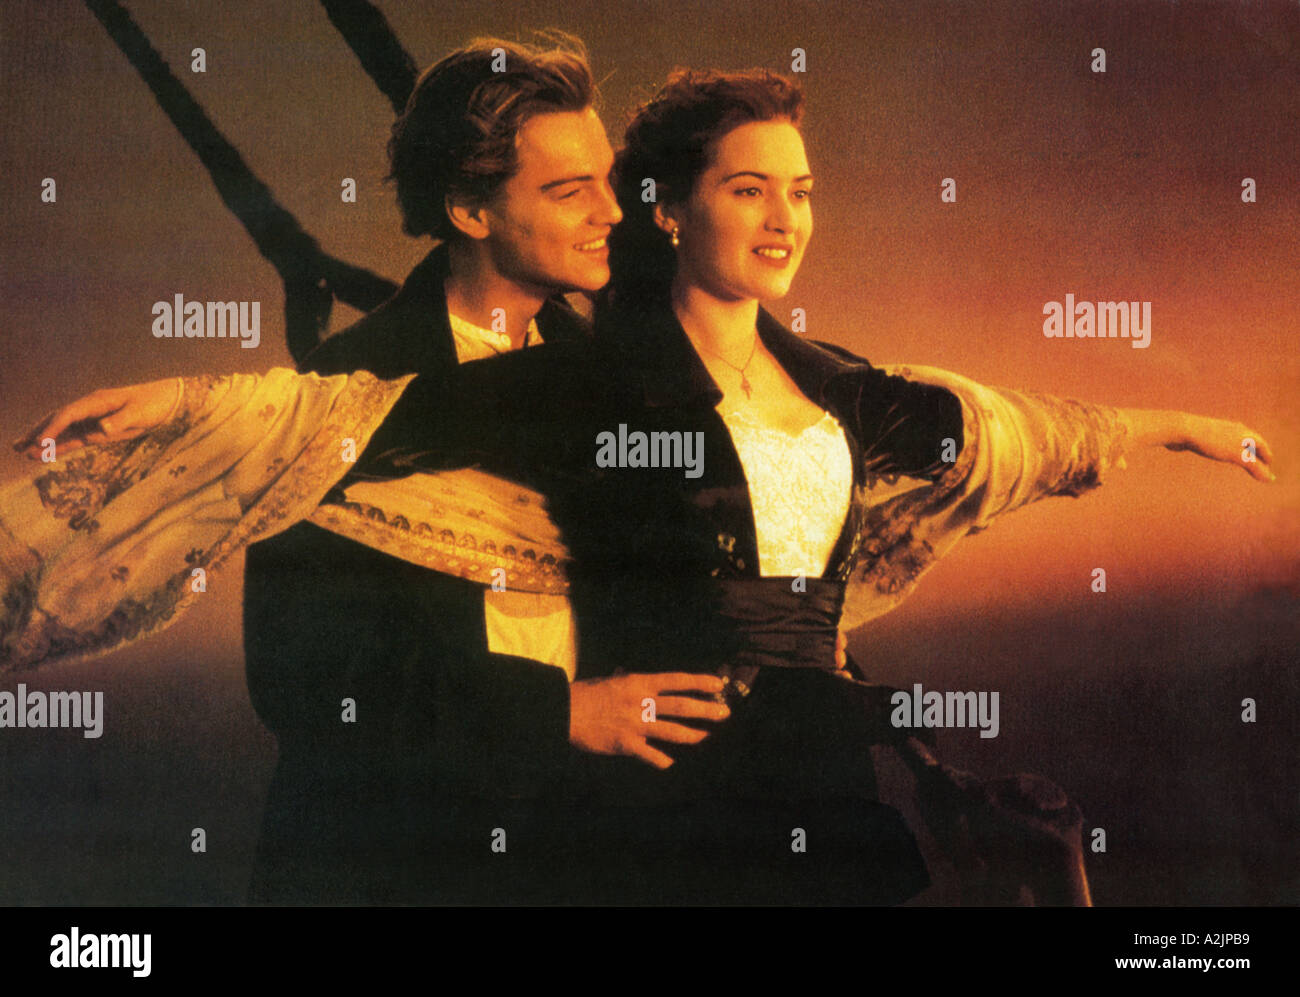 TITANIC-Oscar-prämierten 1997 Film mit Leonardo DiCaprio und Kate WinsletStockfoto